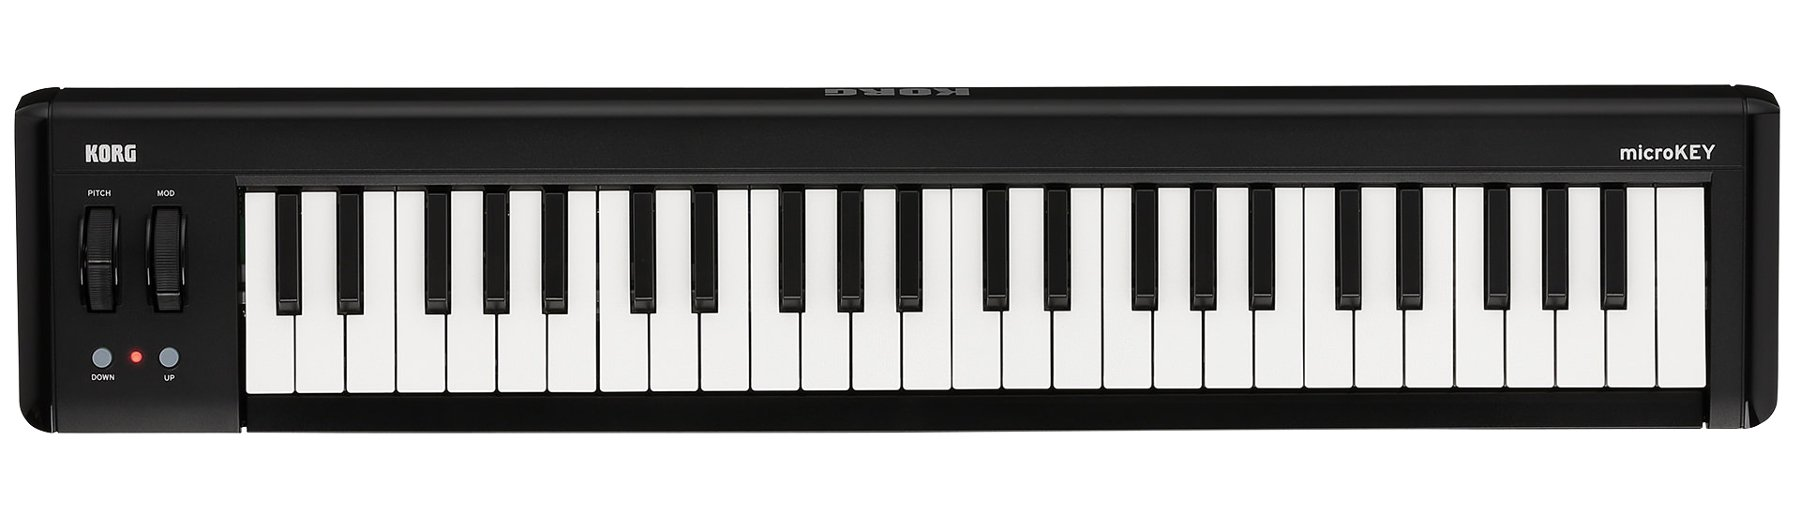 Korg microKEY2-49 49-Key iOS-Powerable USB MIDI Controller with Pedal Input MICROKEY-2-49